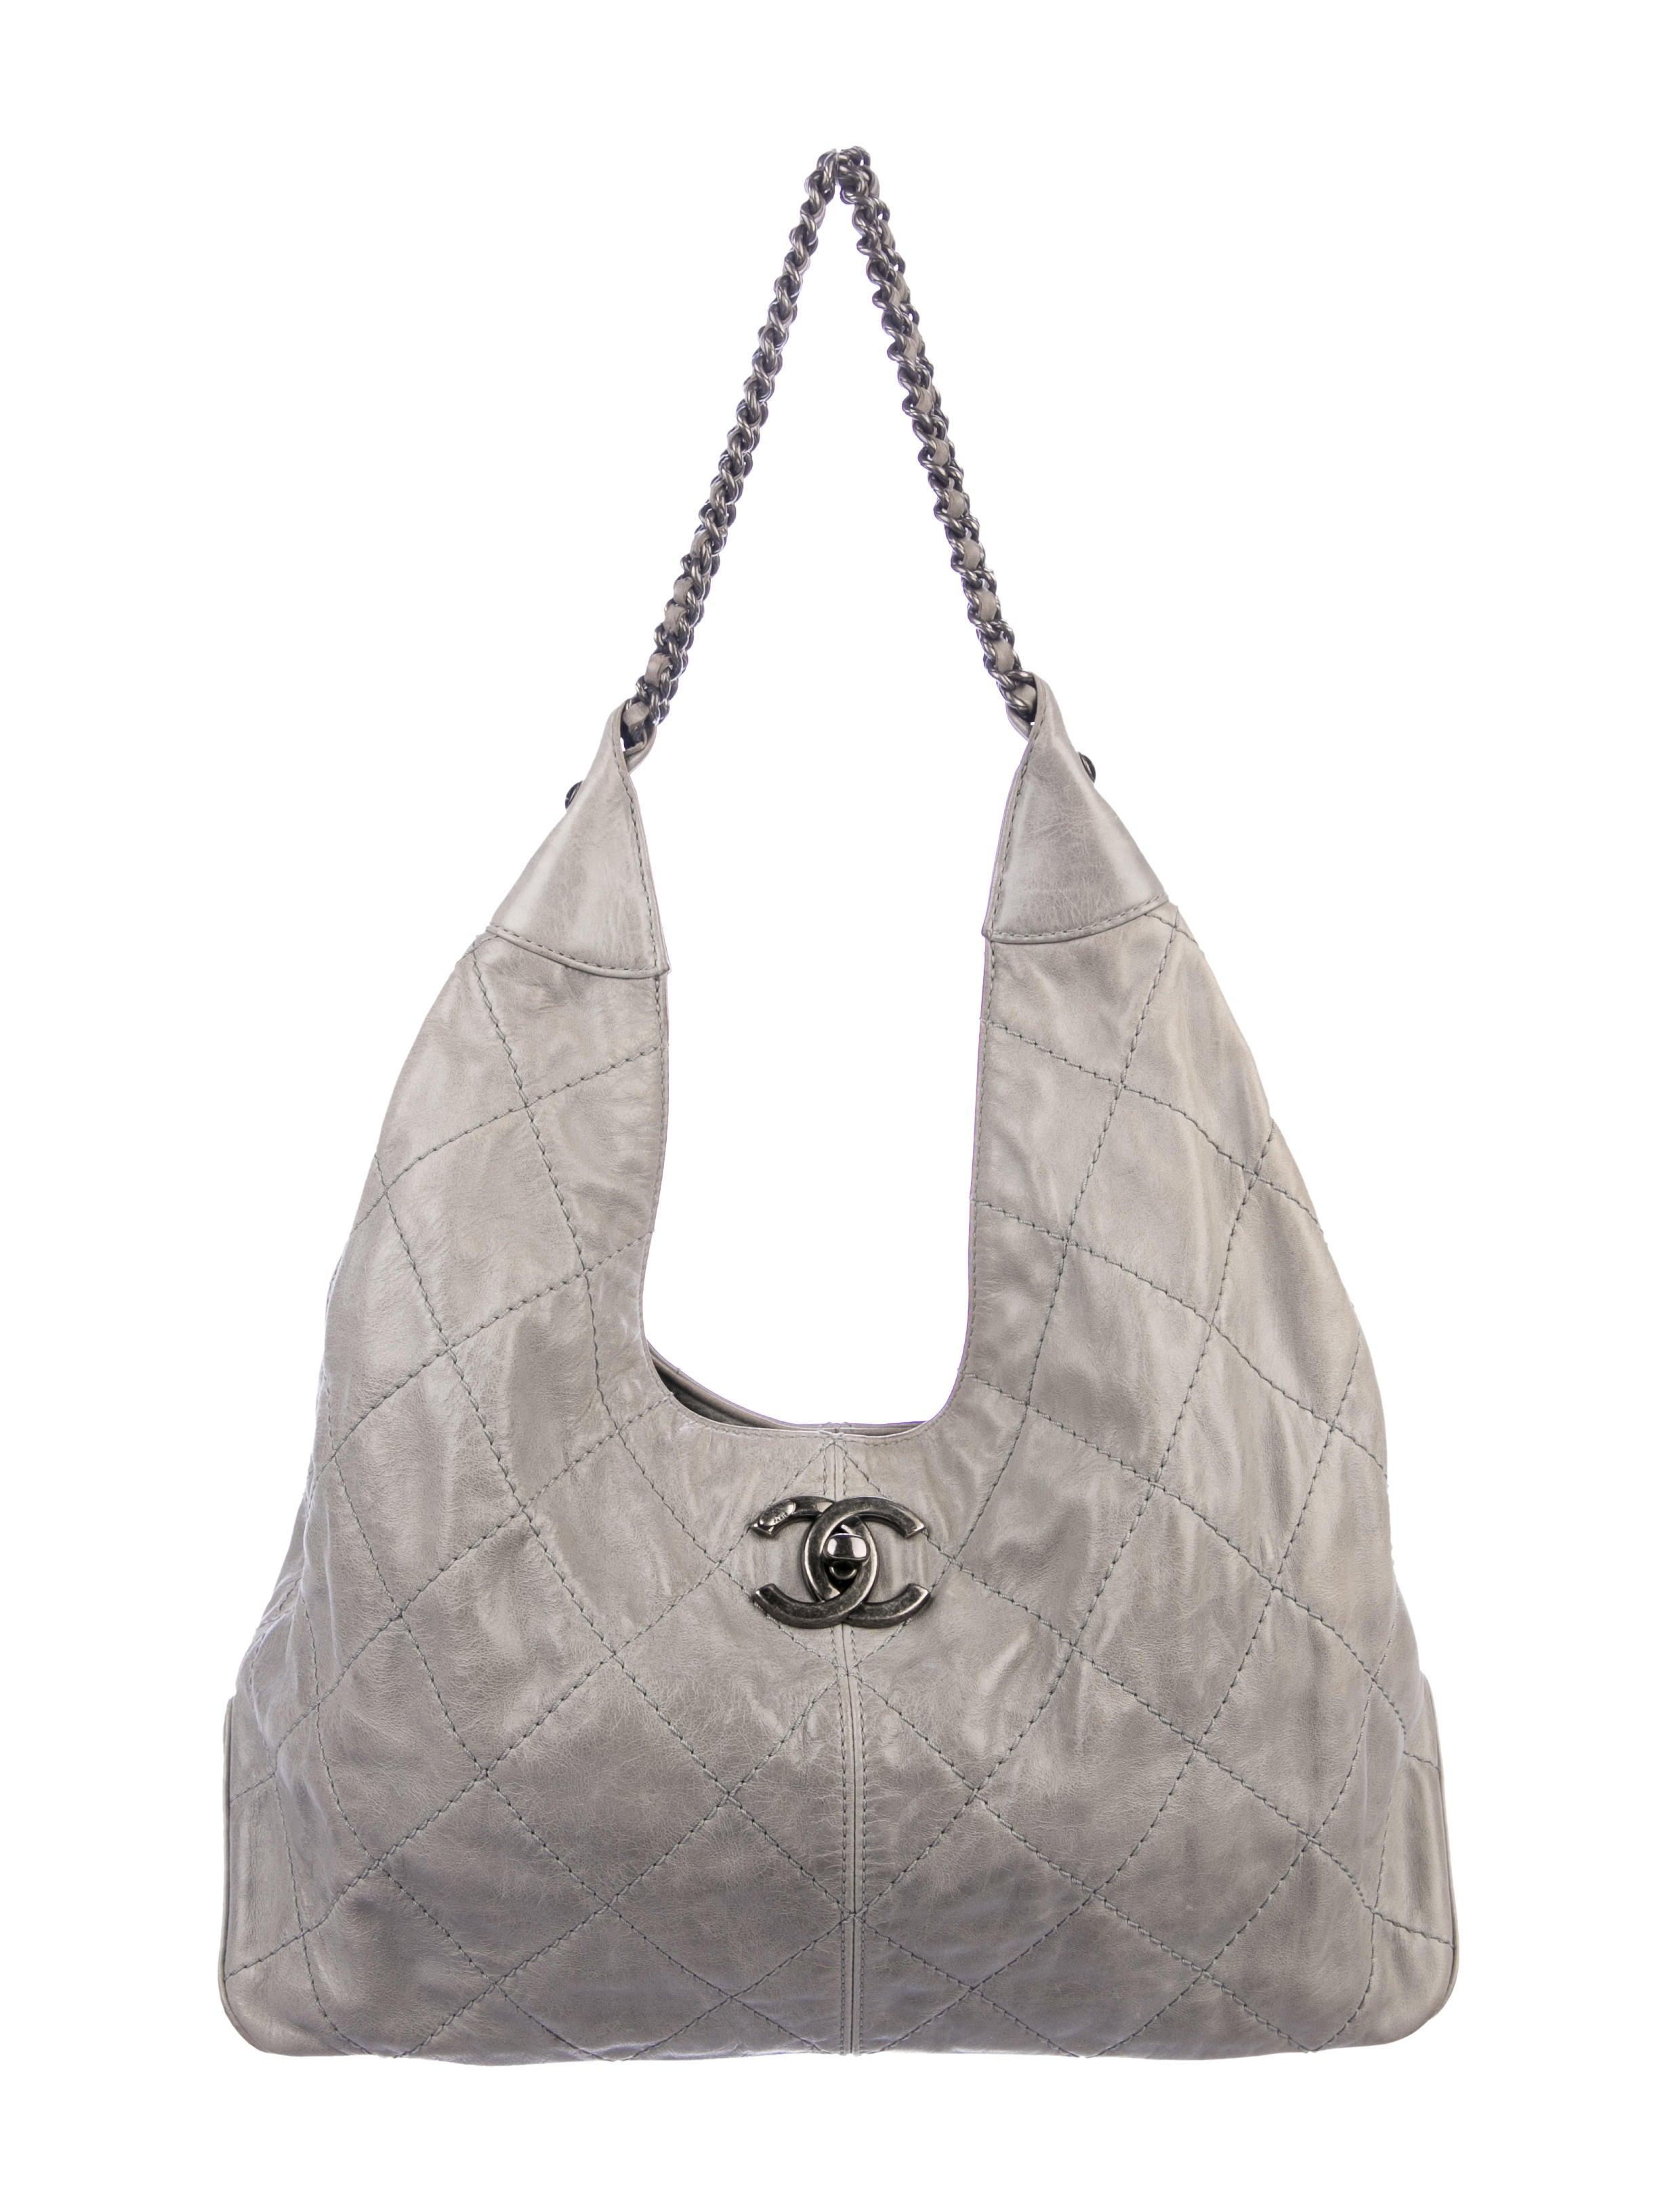 a3193ca68 Chanel Handbags | The RealReal